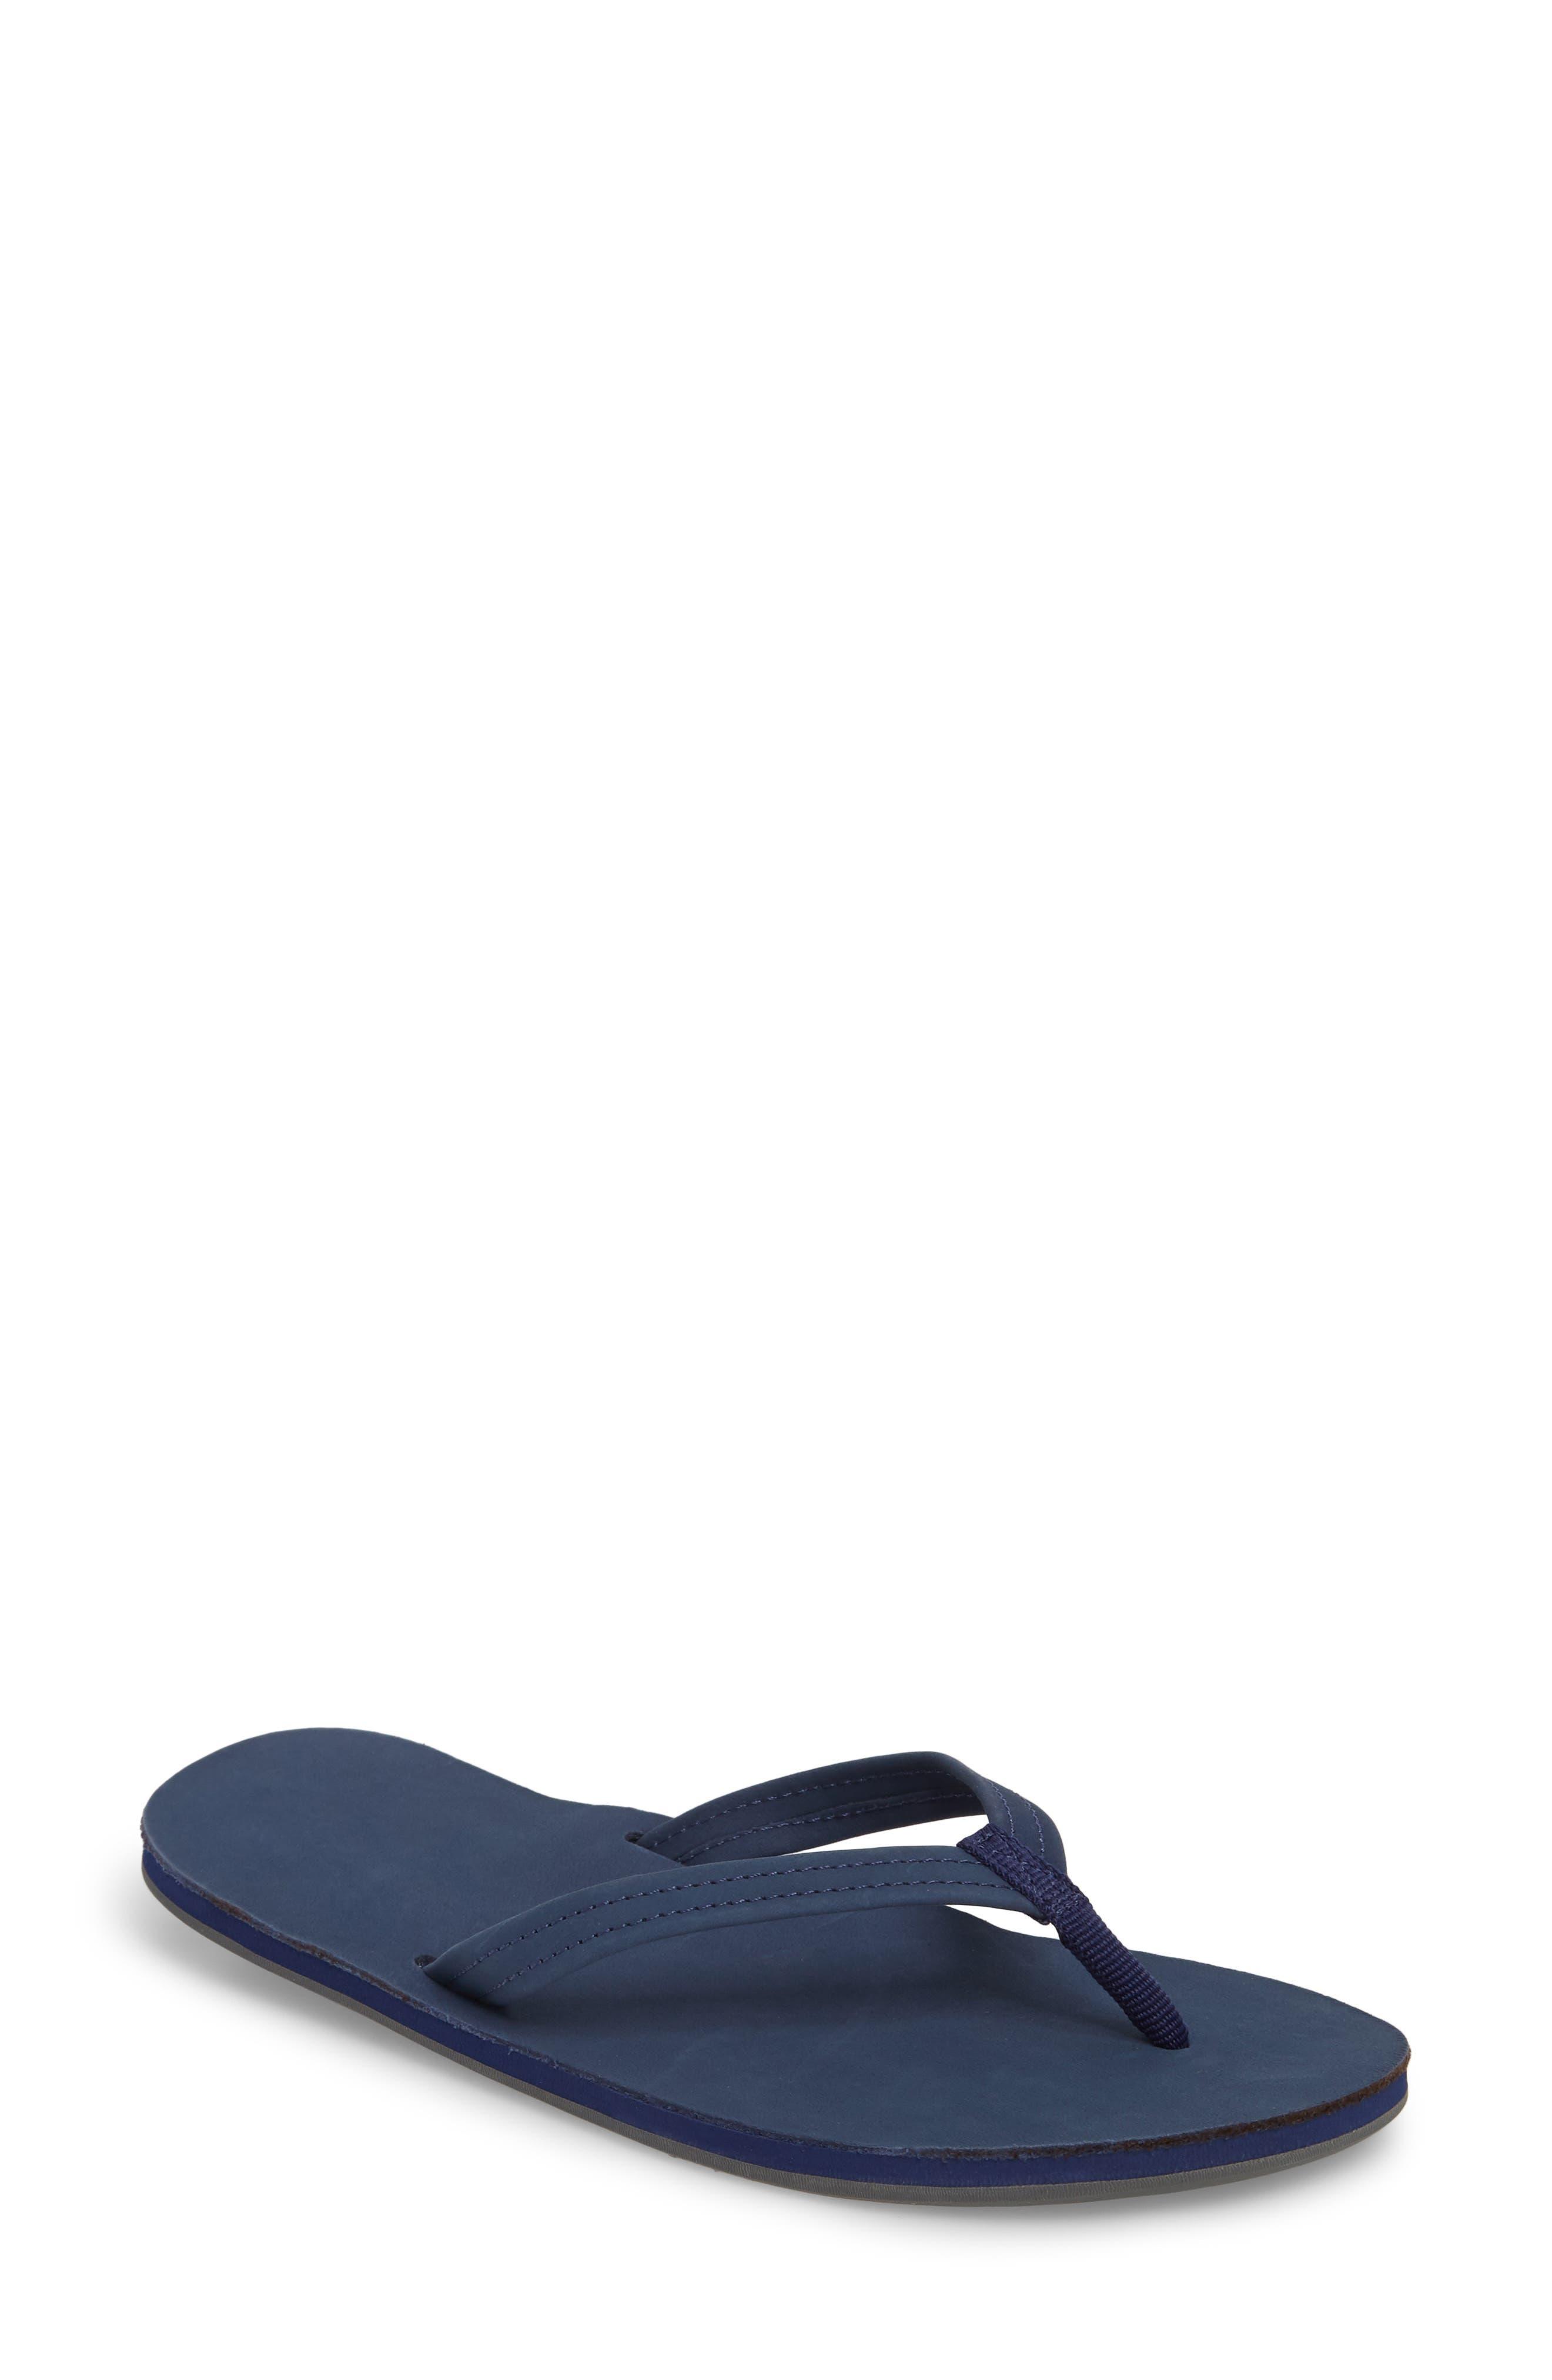 Fields Flip Flop,                         Main,                         color, Navy Peach Gray